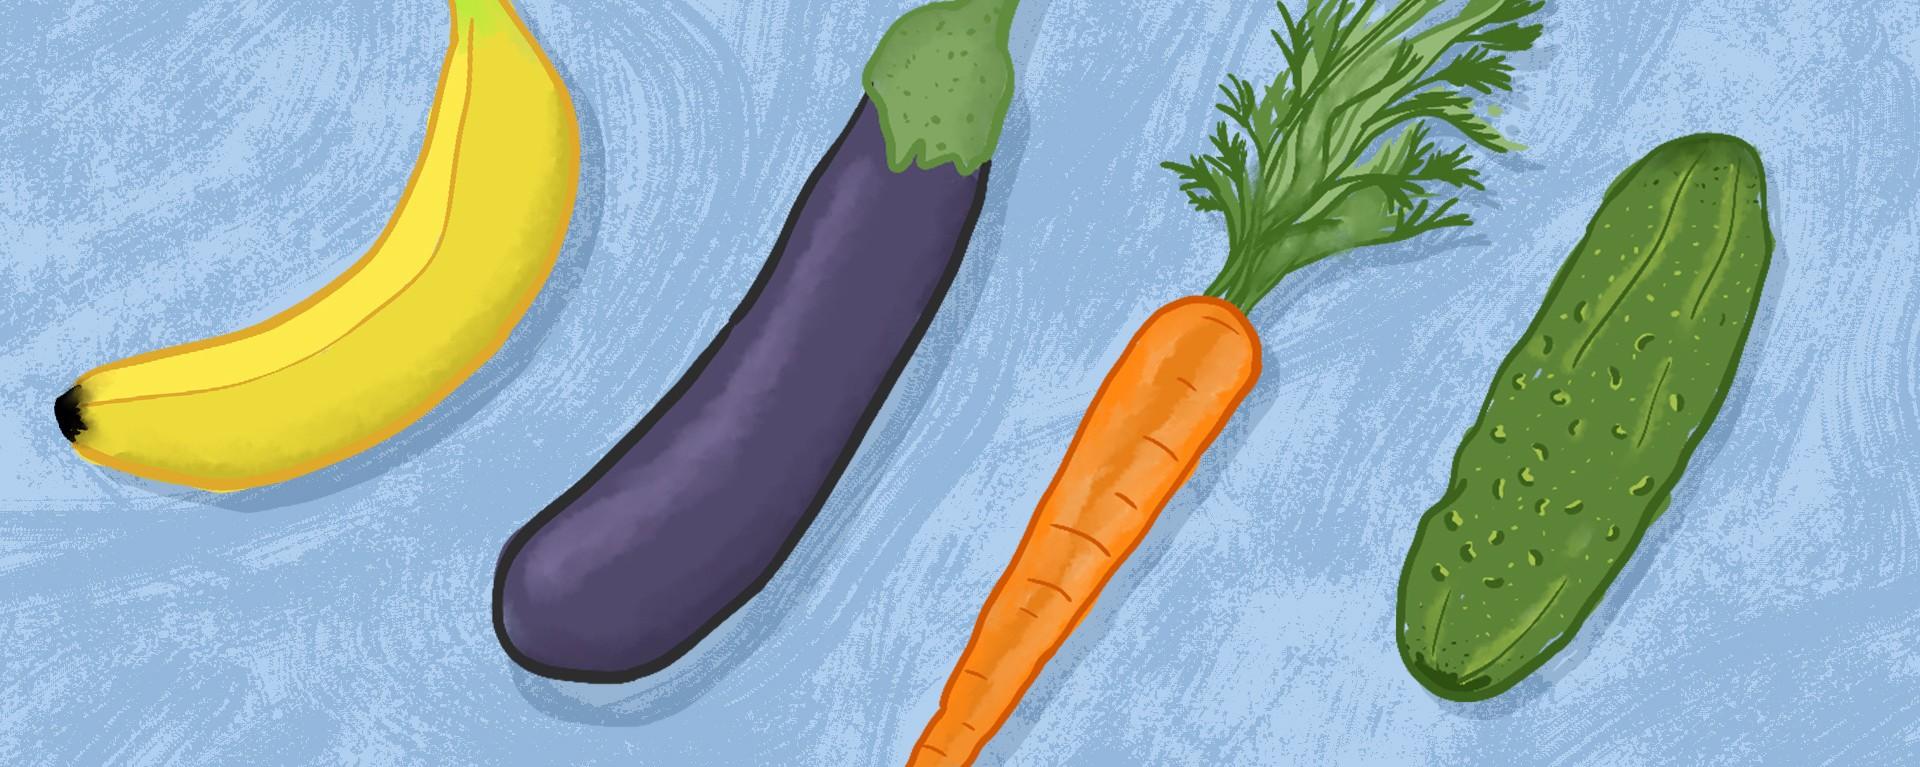 leguma este ca un penis